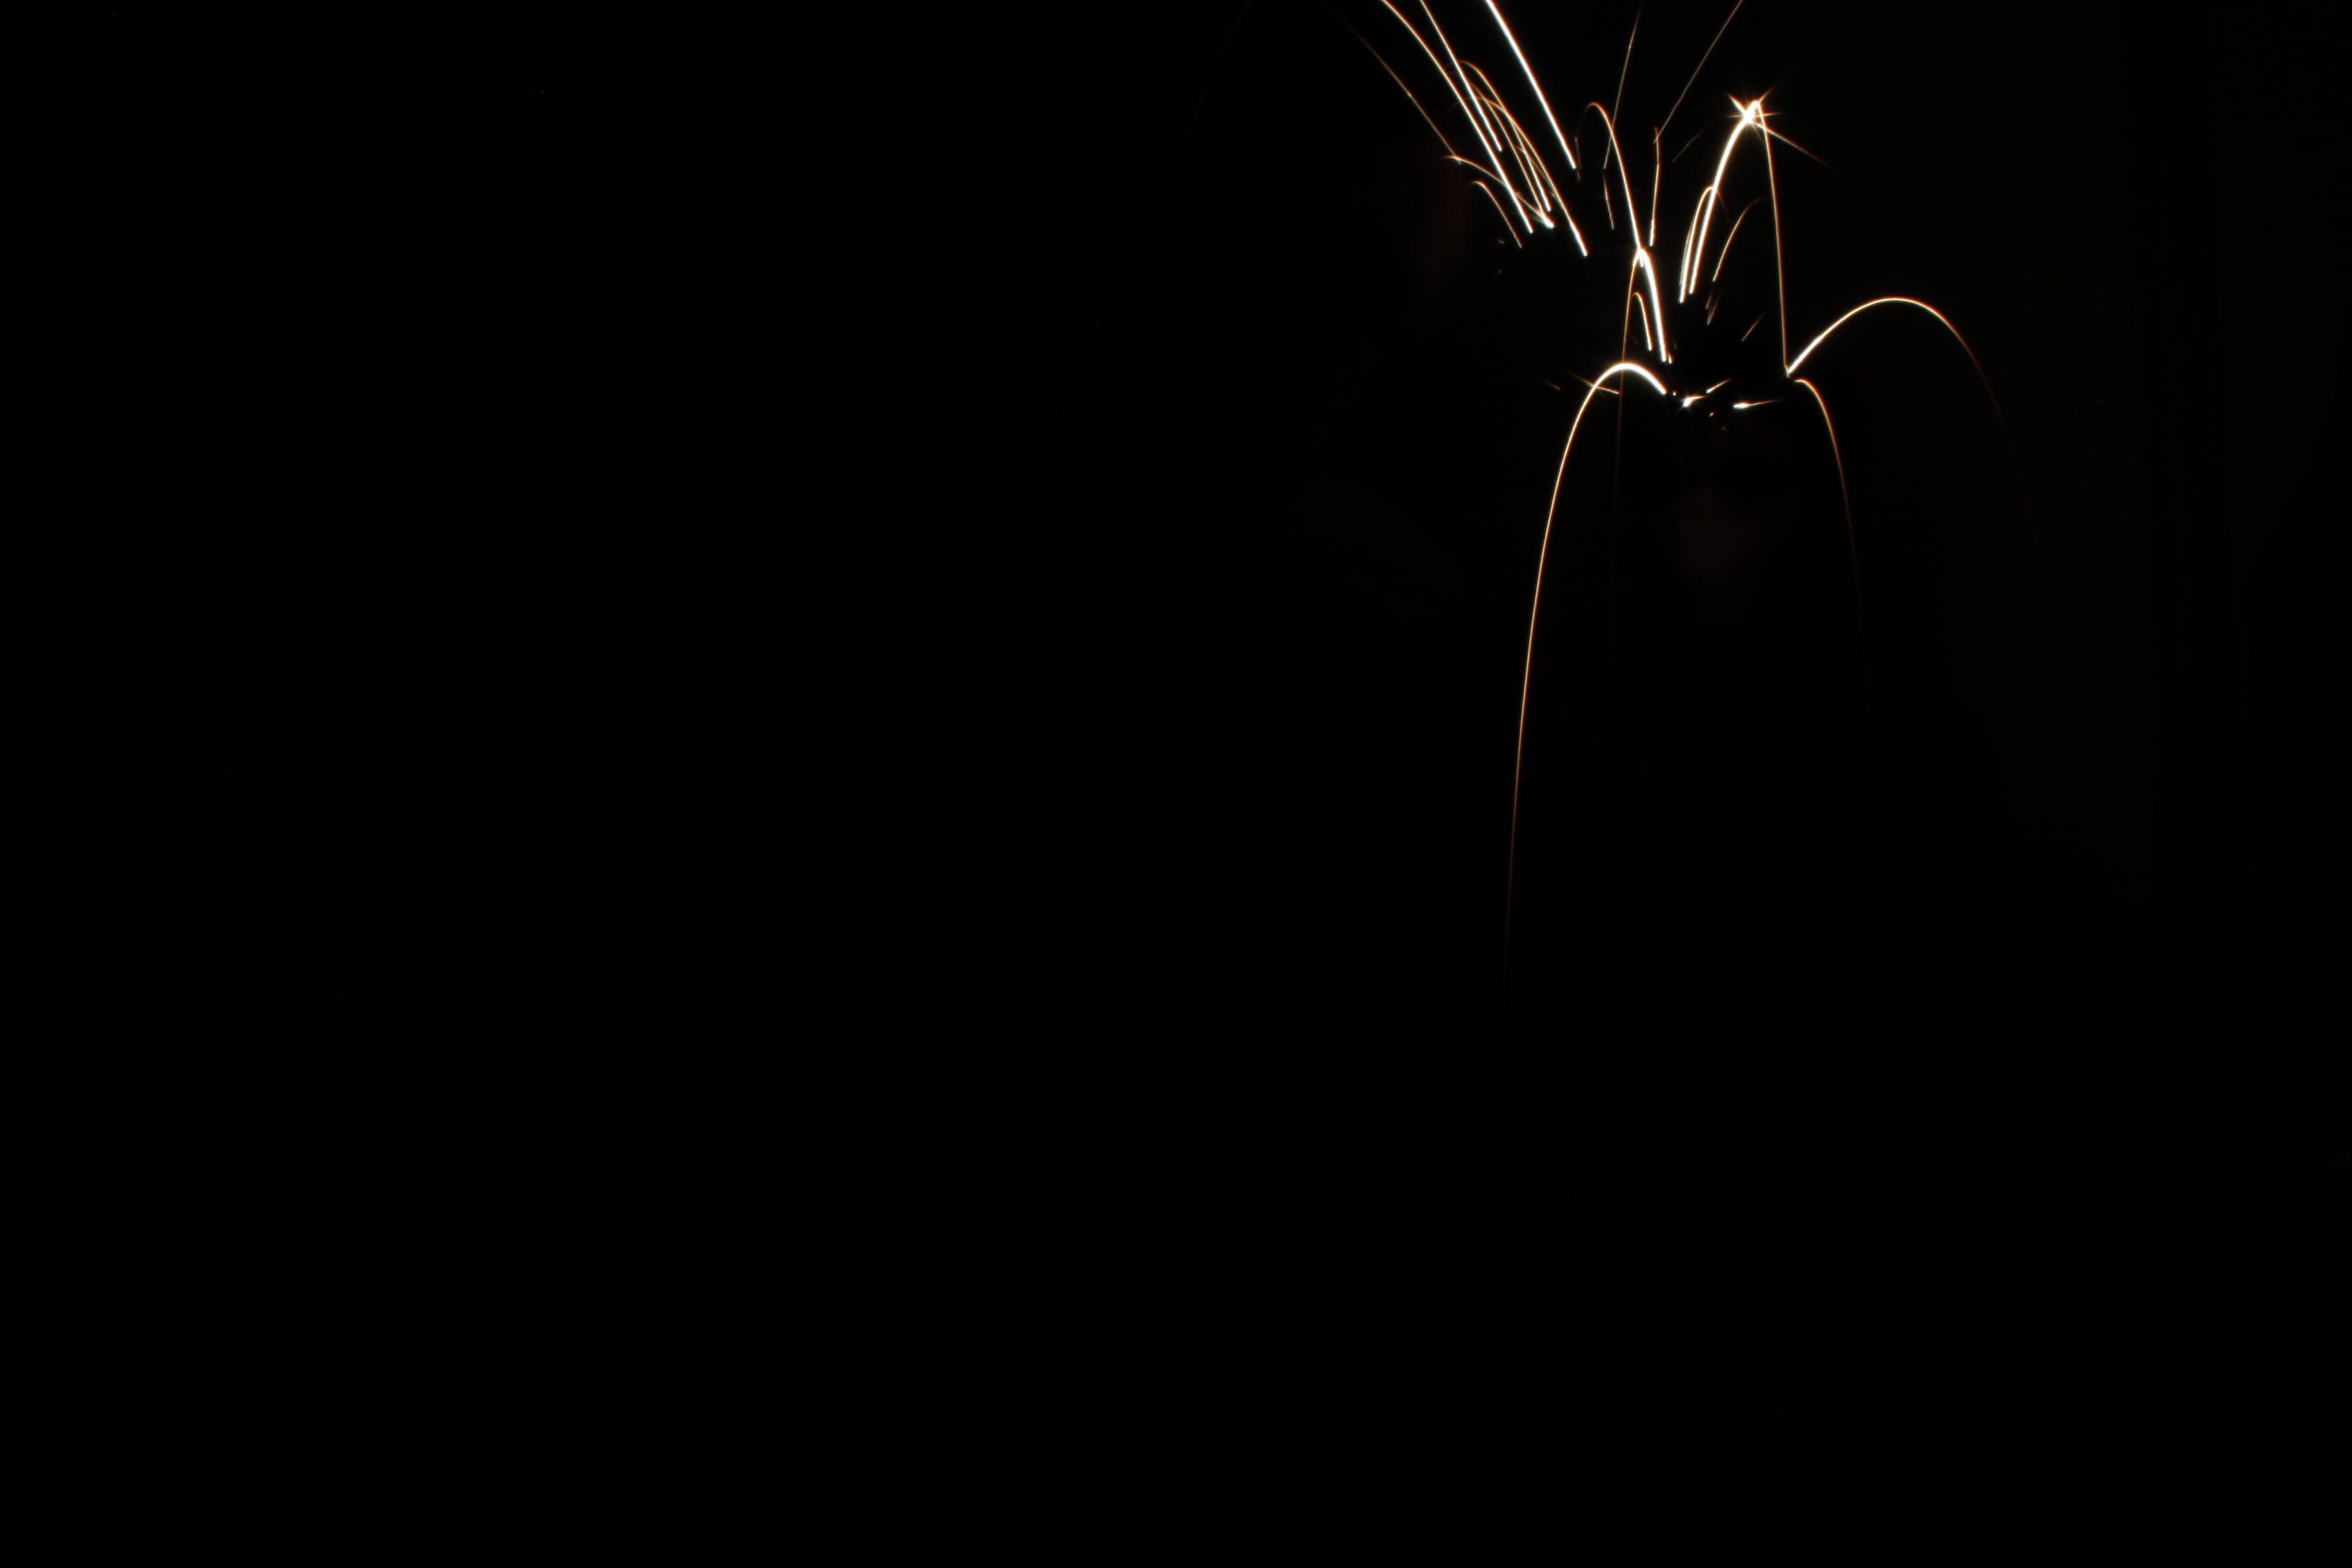 Kostenloses Stock Foto zu brennen, dunkel, feuer, funken